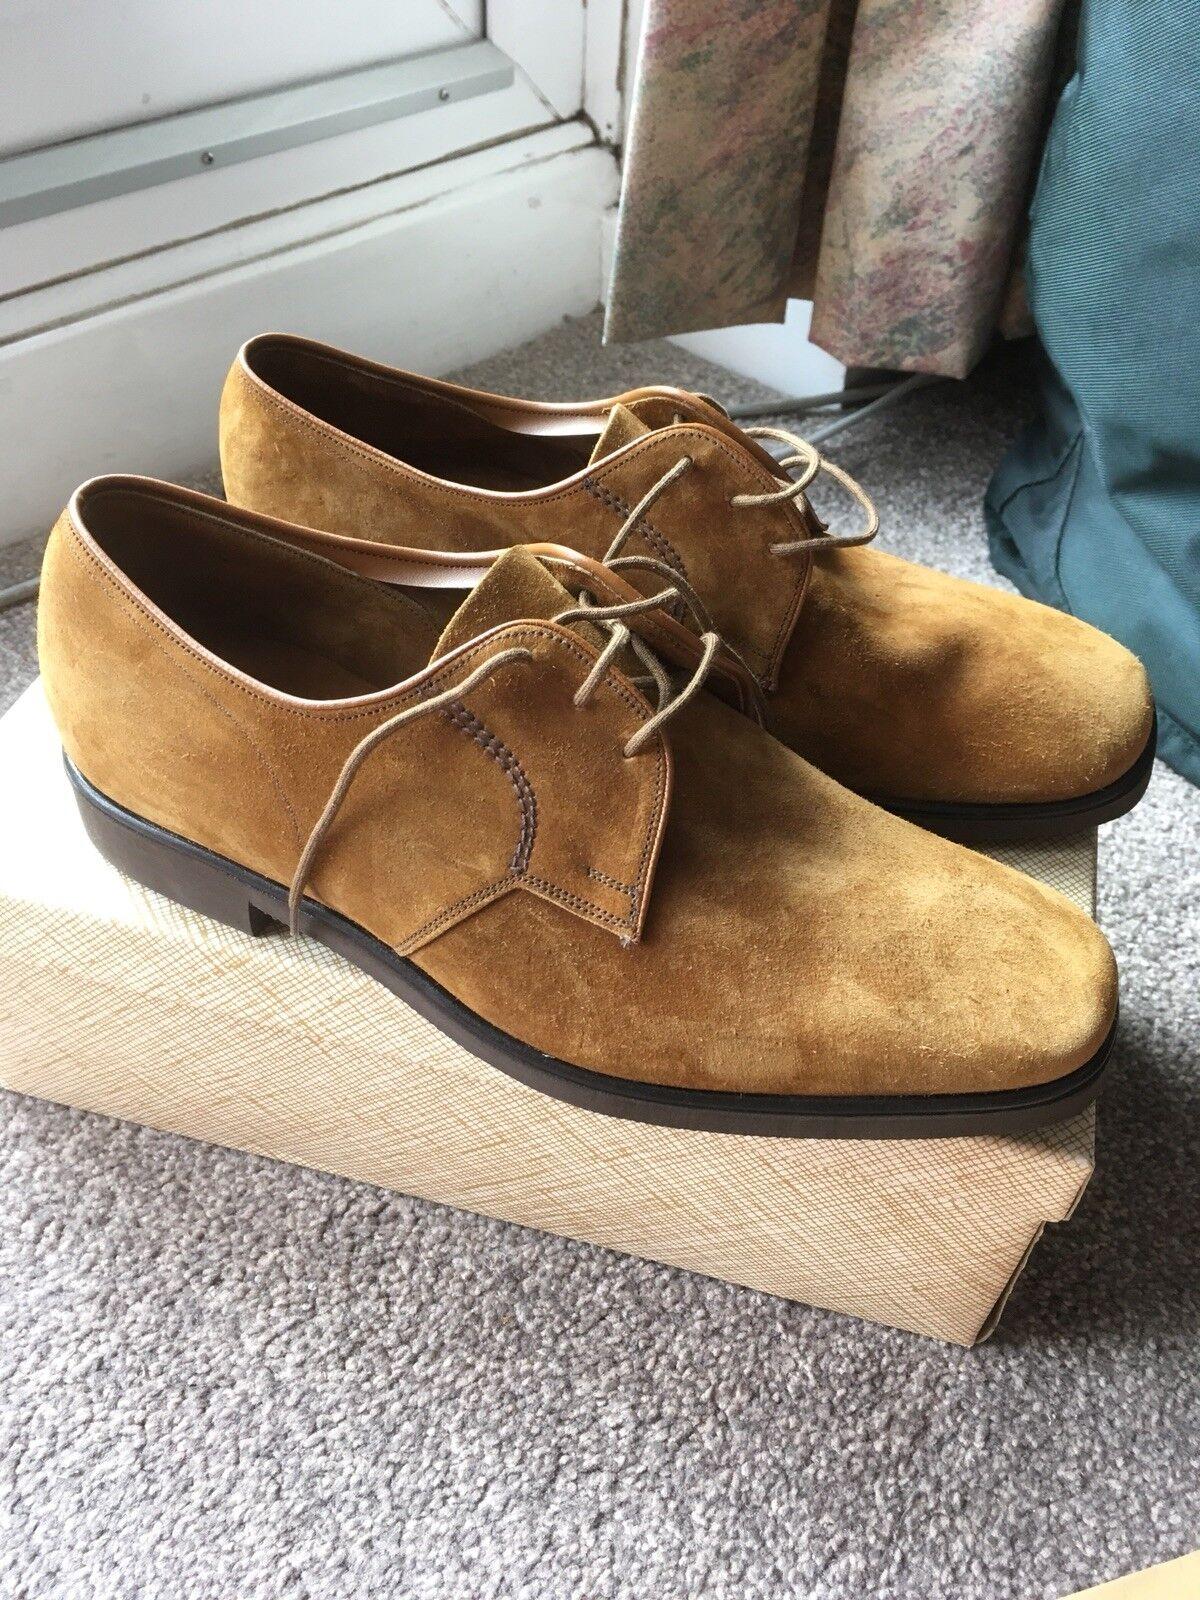 Churchs shoes Hippopotamus Suede 7 1 2. New In Box